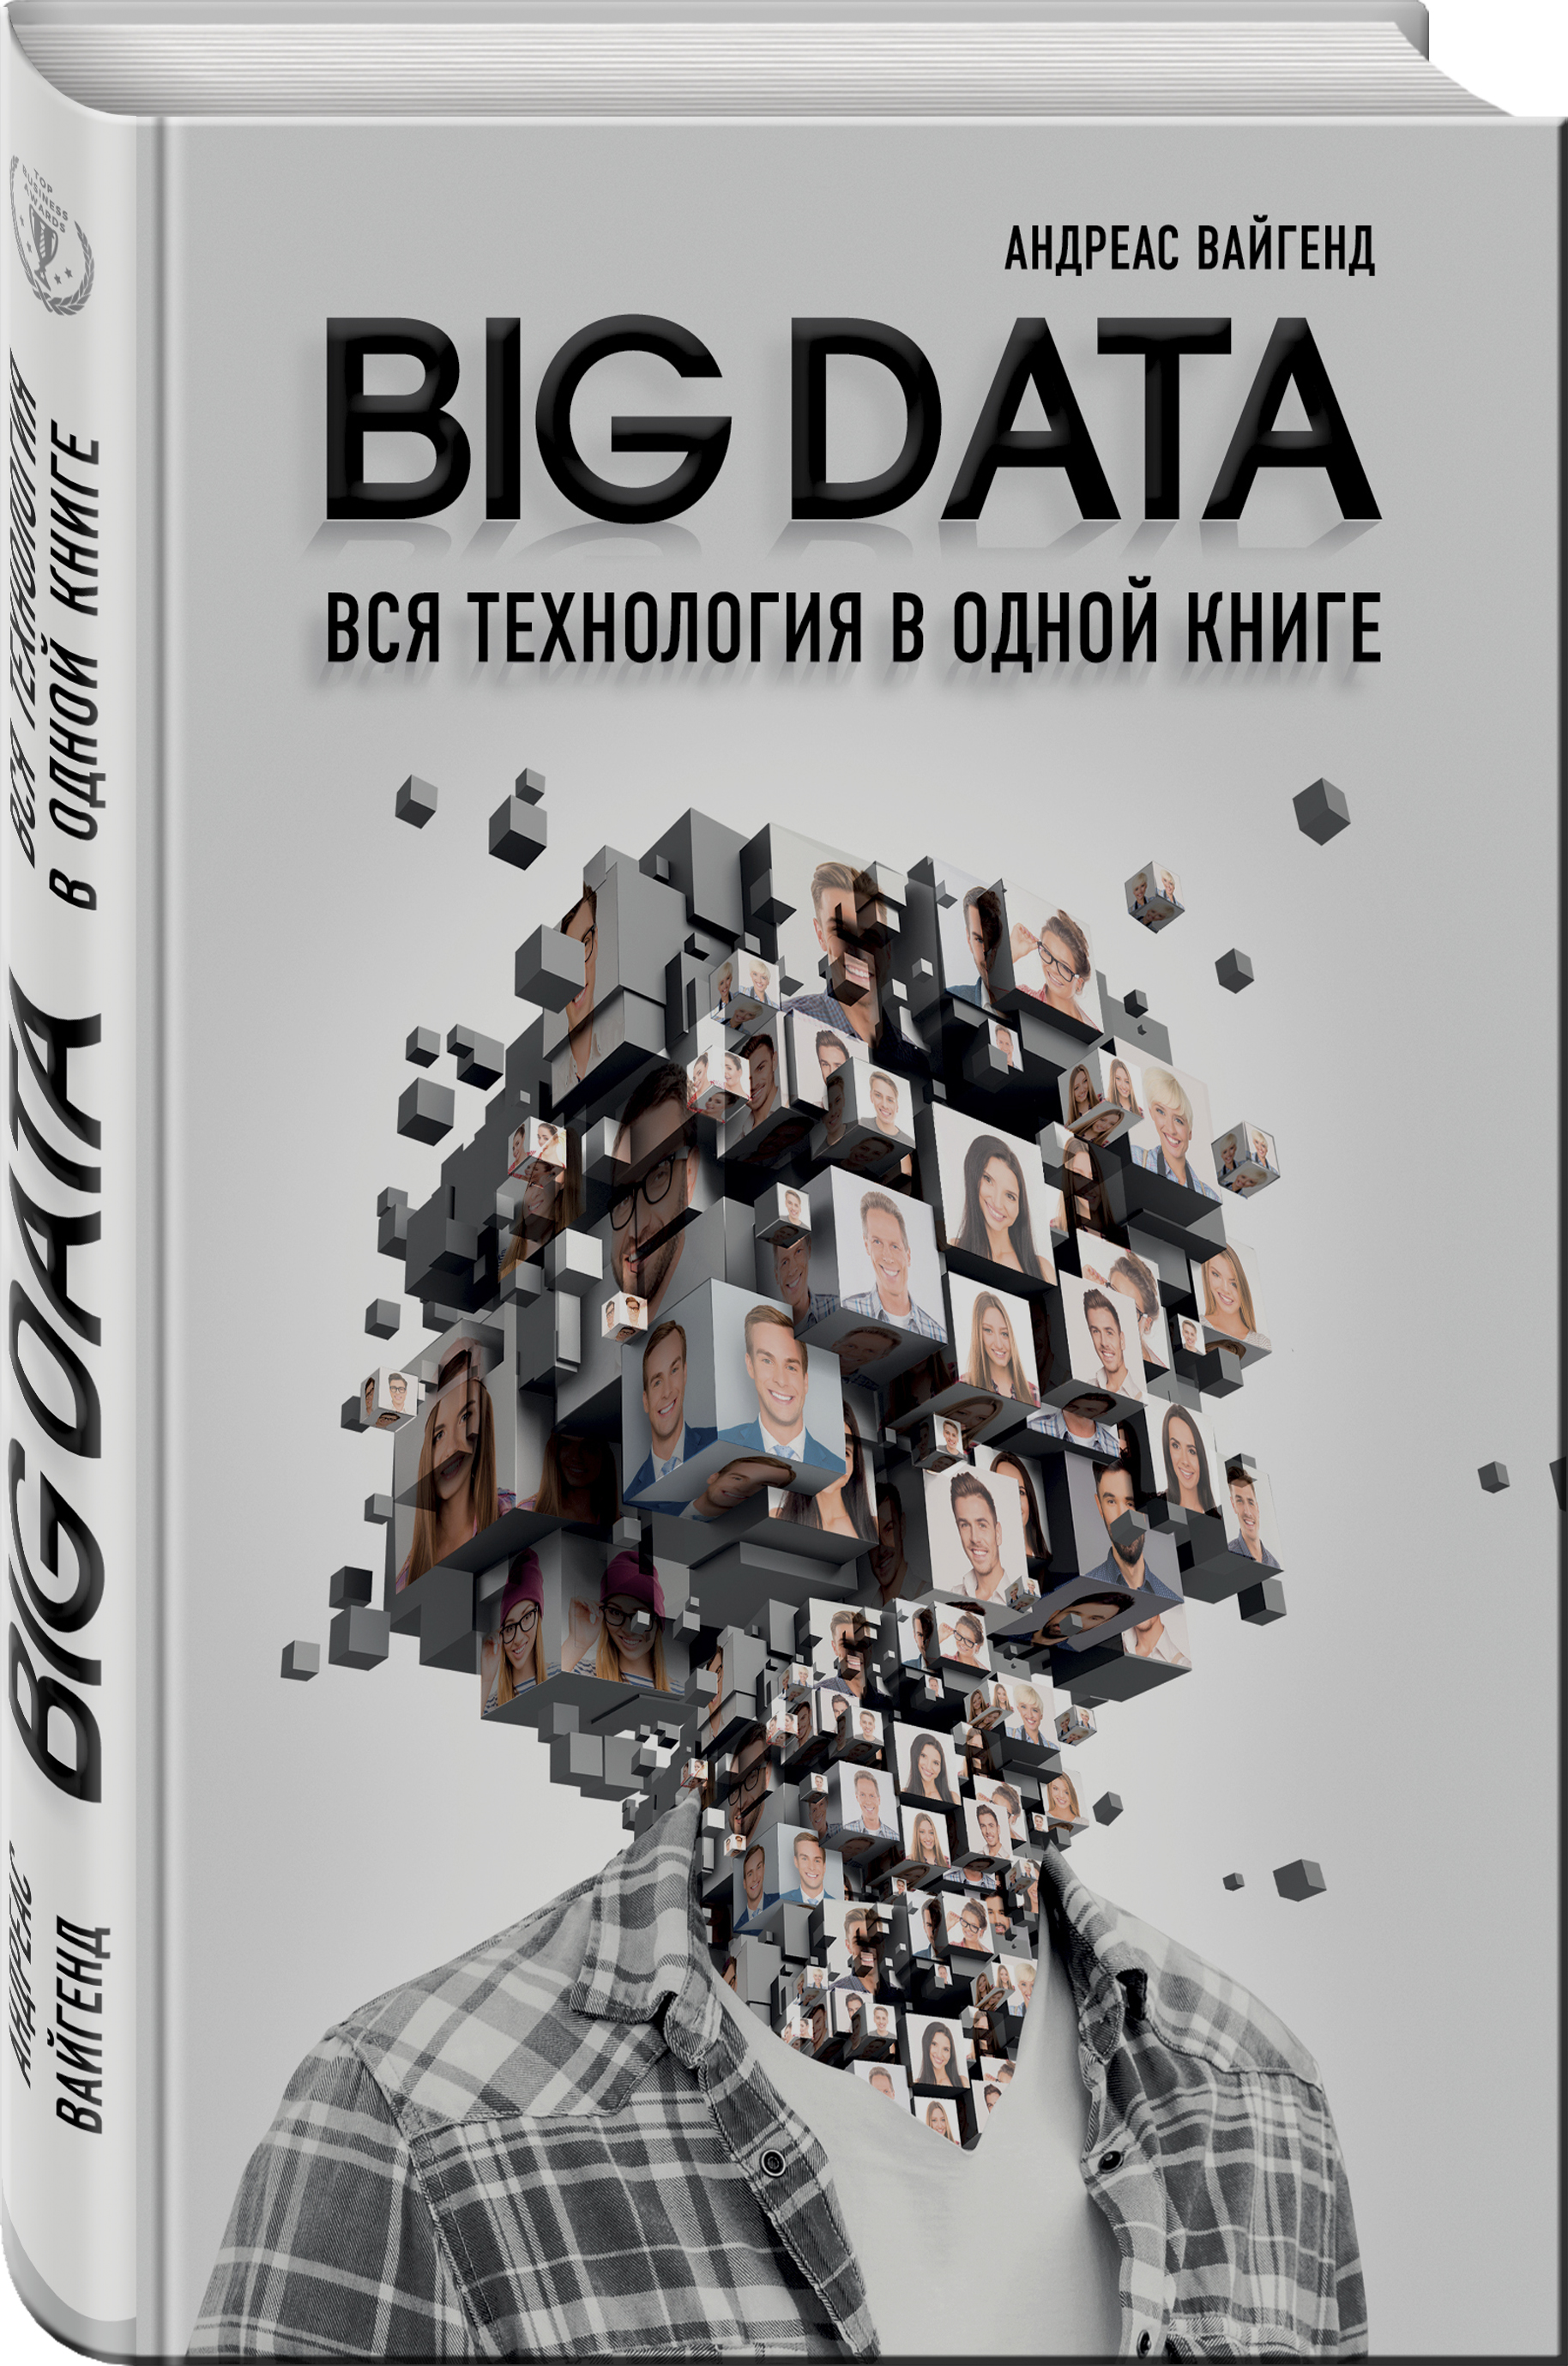 Андреас Вайгенд BIG DATA. Вся технология в одной книге цена 2017